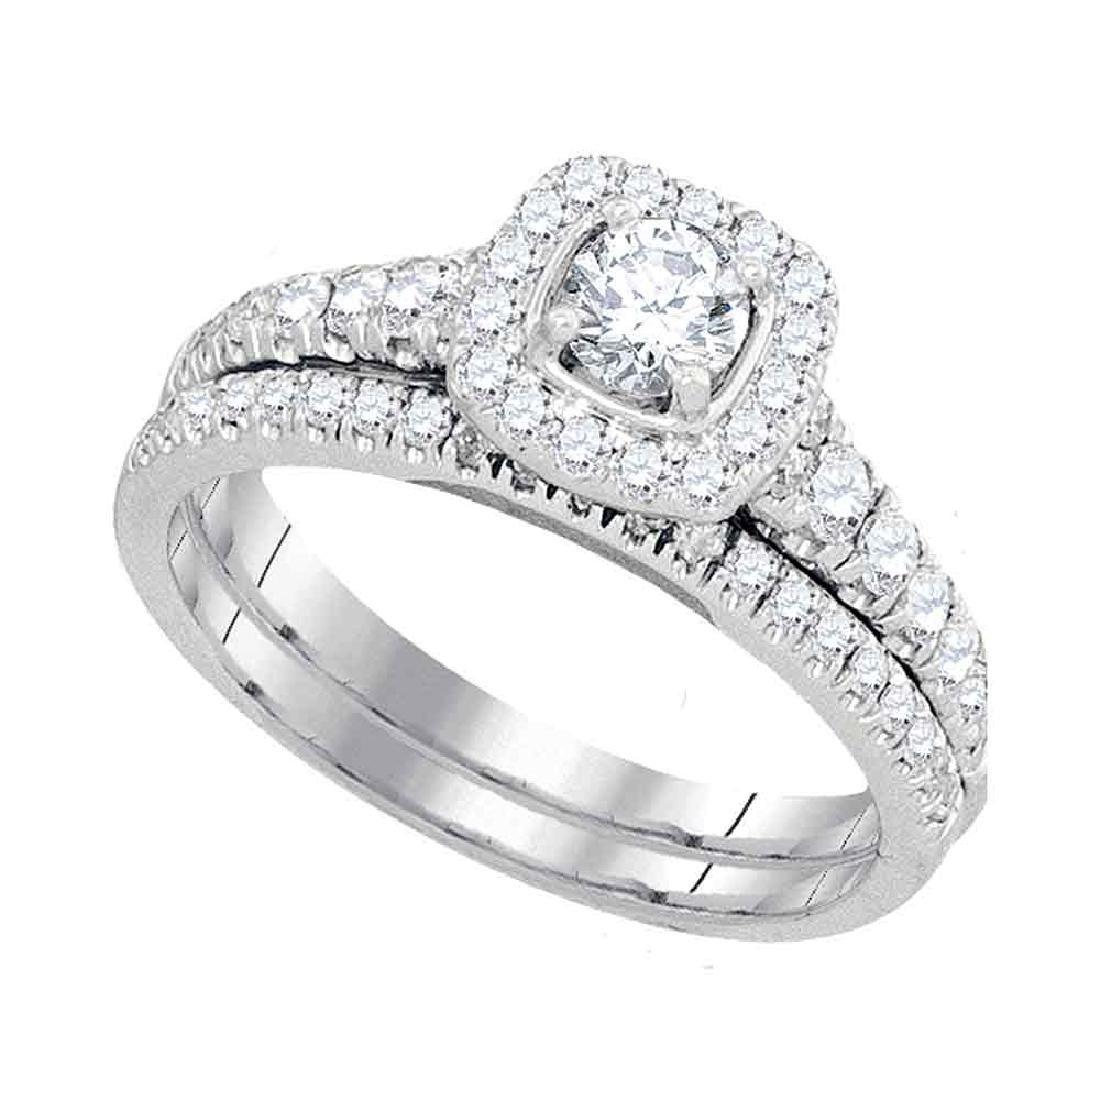 1.01 CTW Diamond Bridal Wedding Engagement Ring 14KT